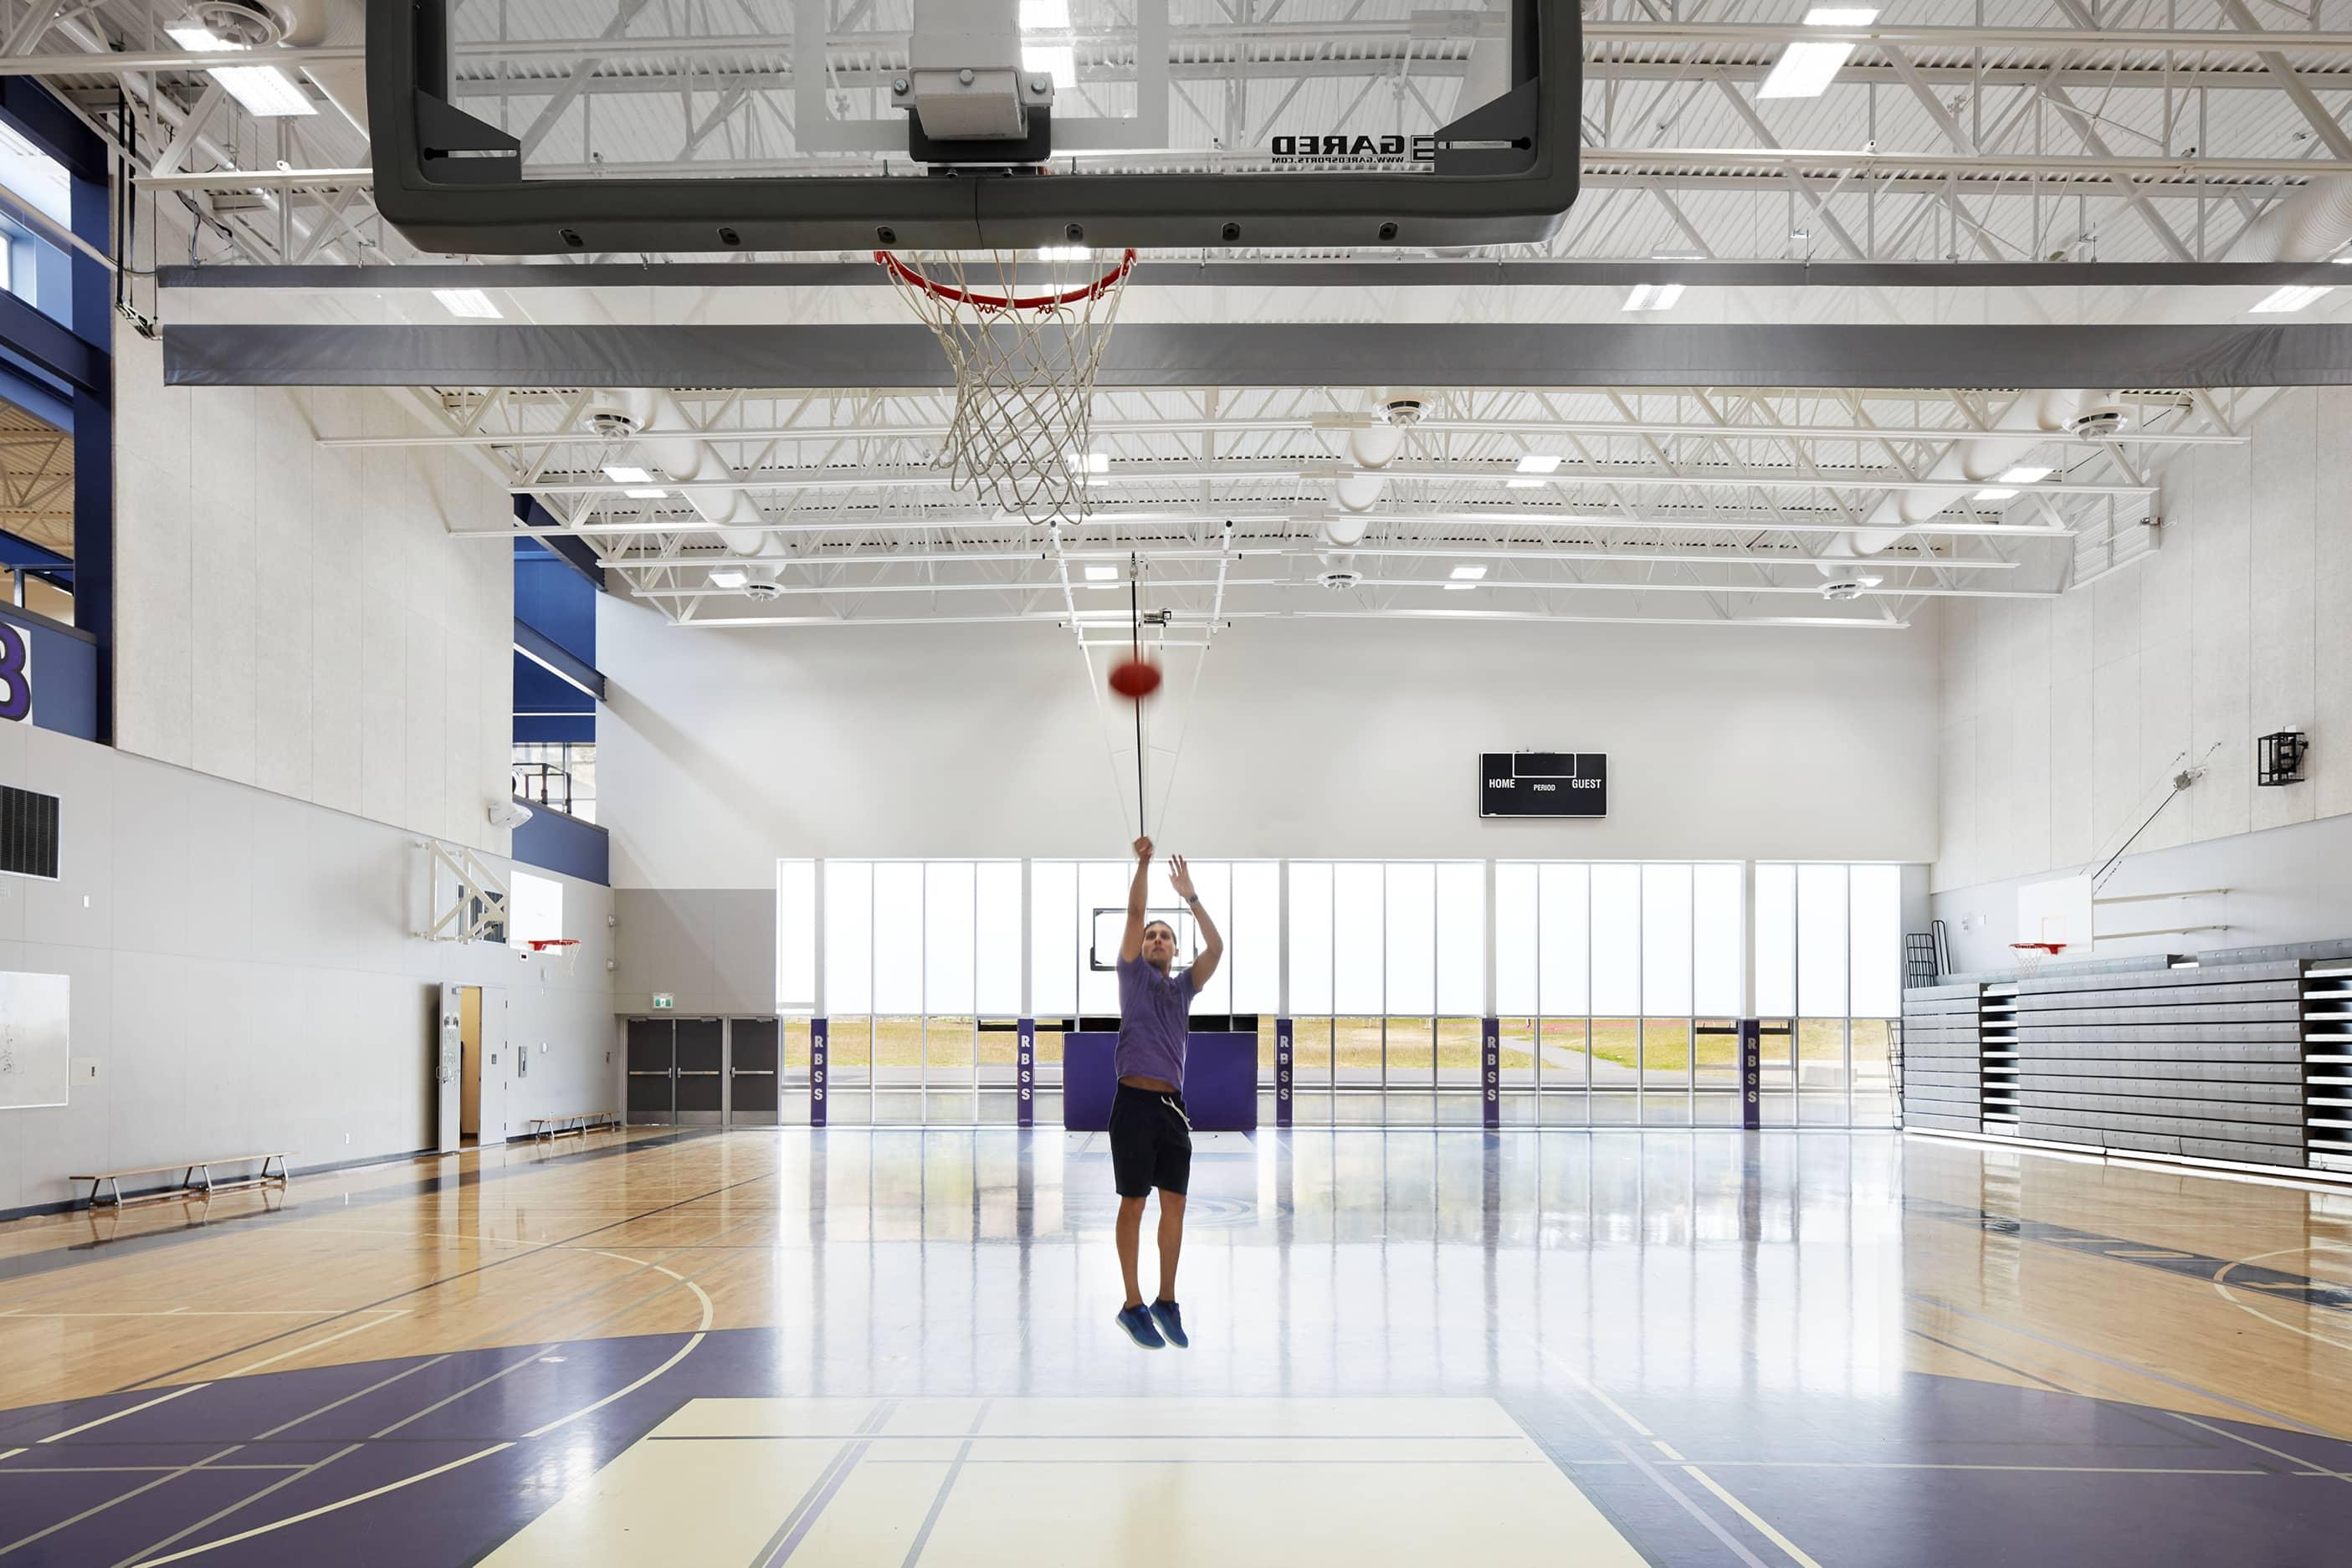 bbp royal bay secondary gym